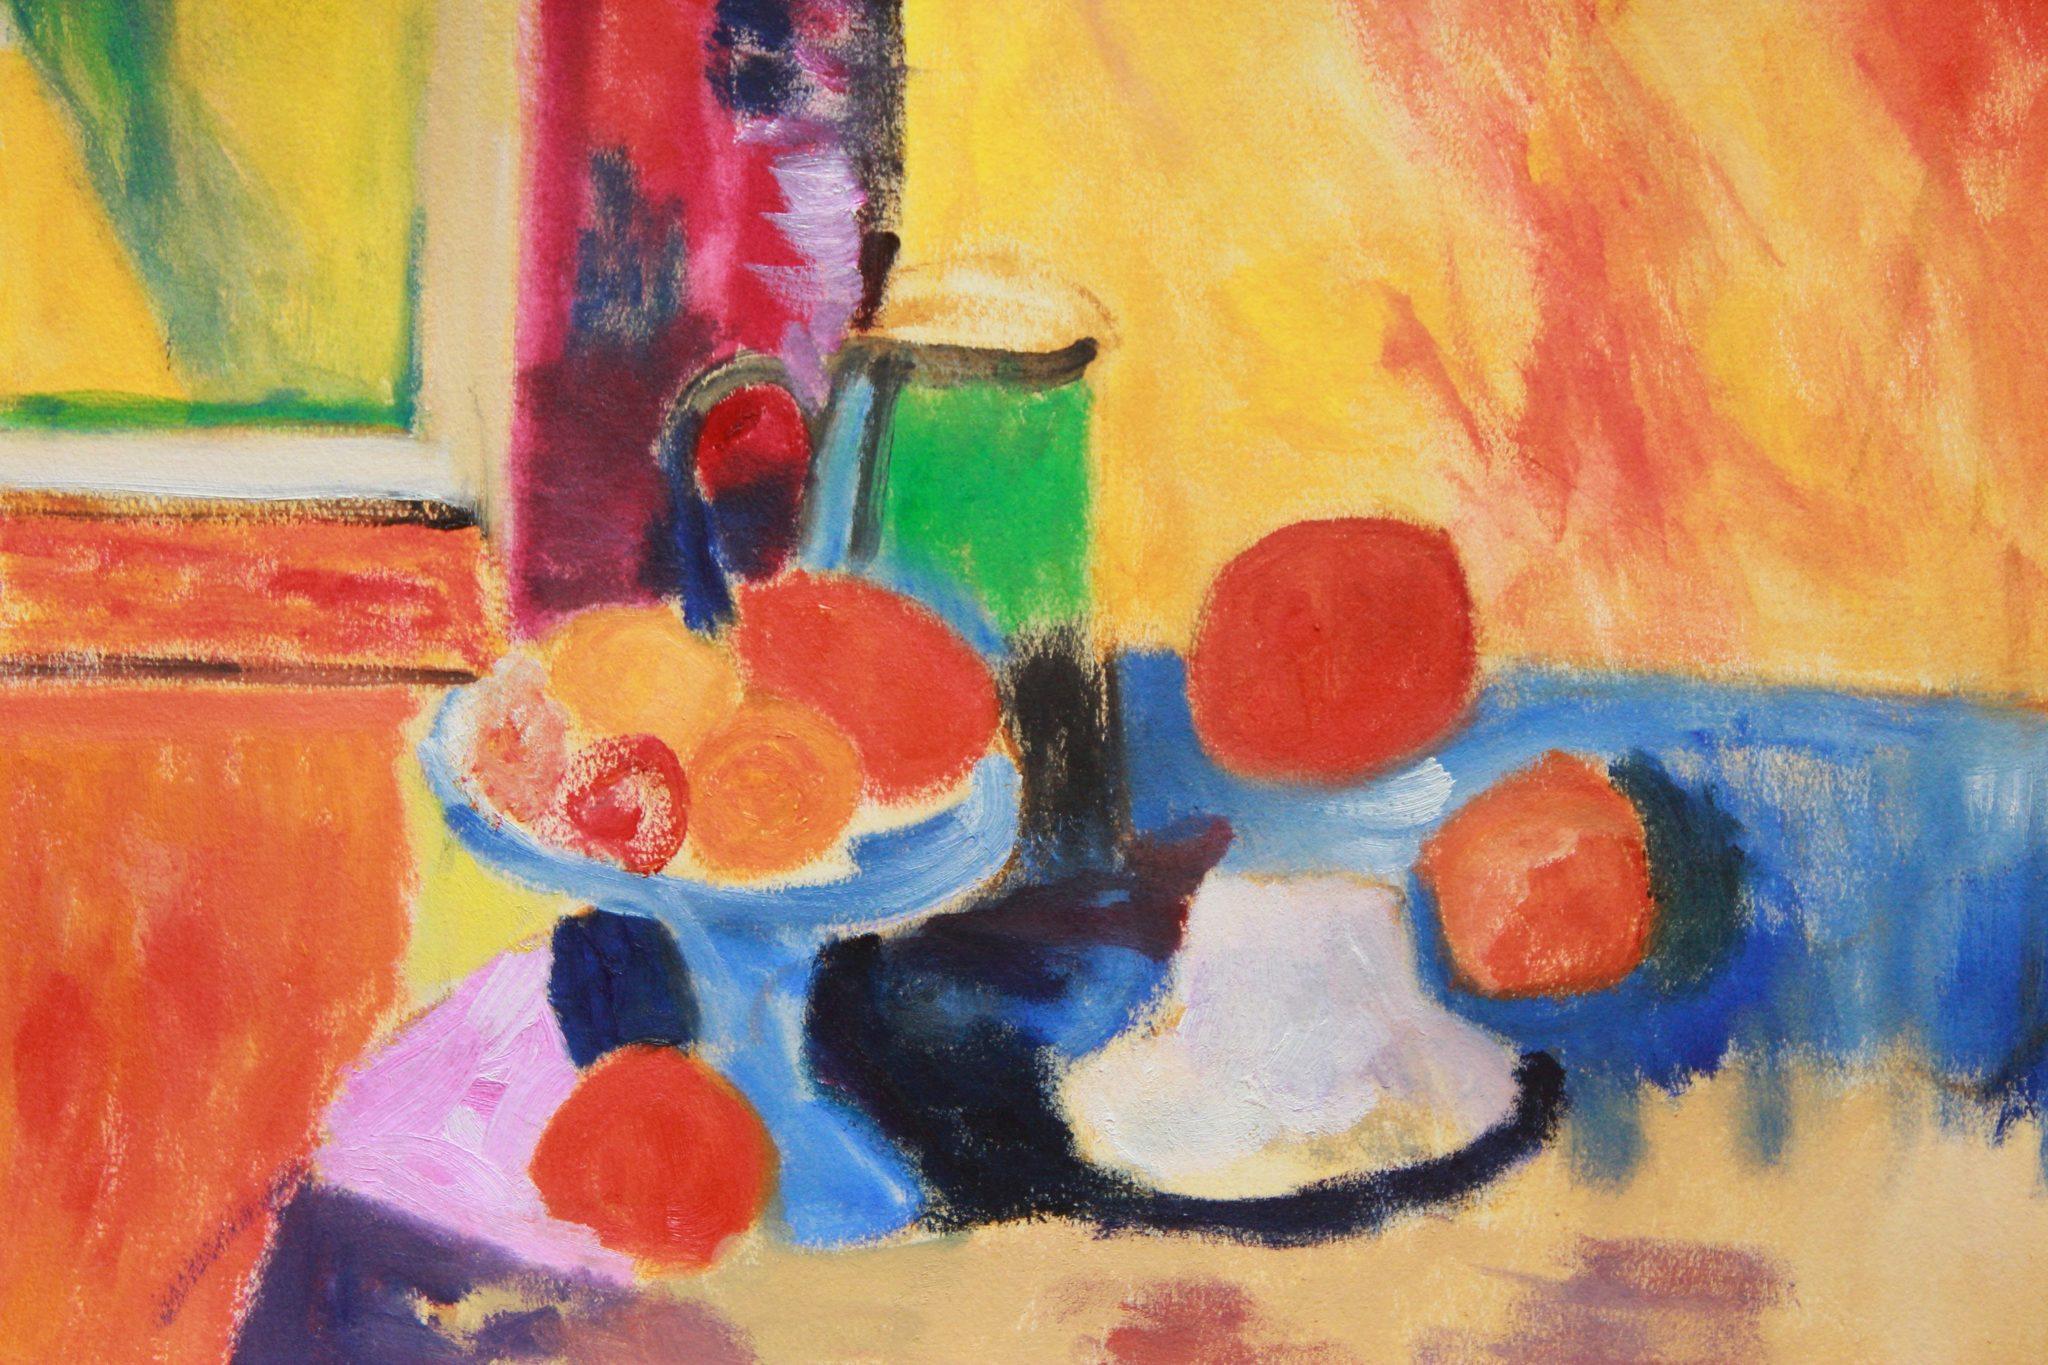 Rothenberg, Lynn - After Matisse